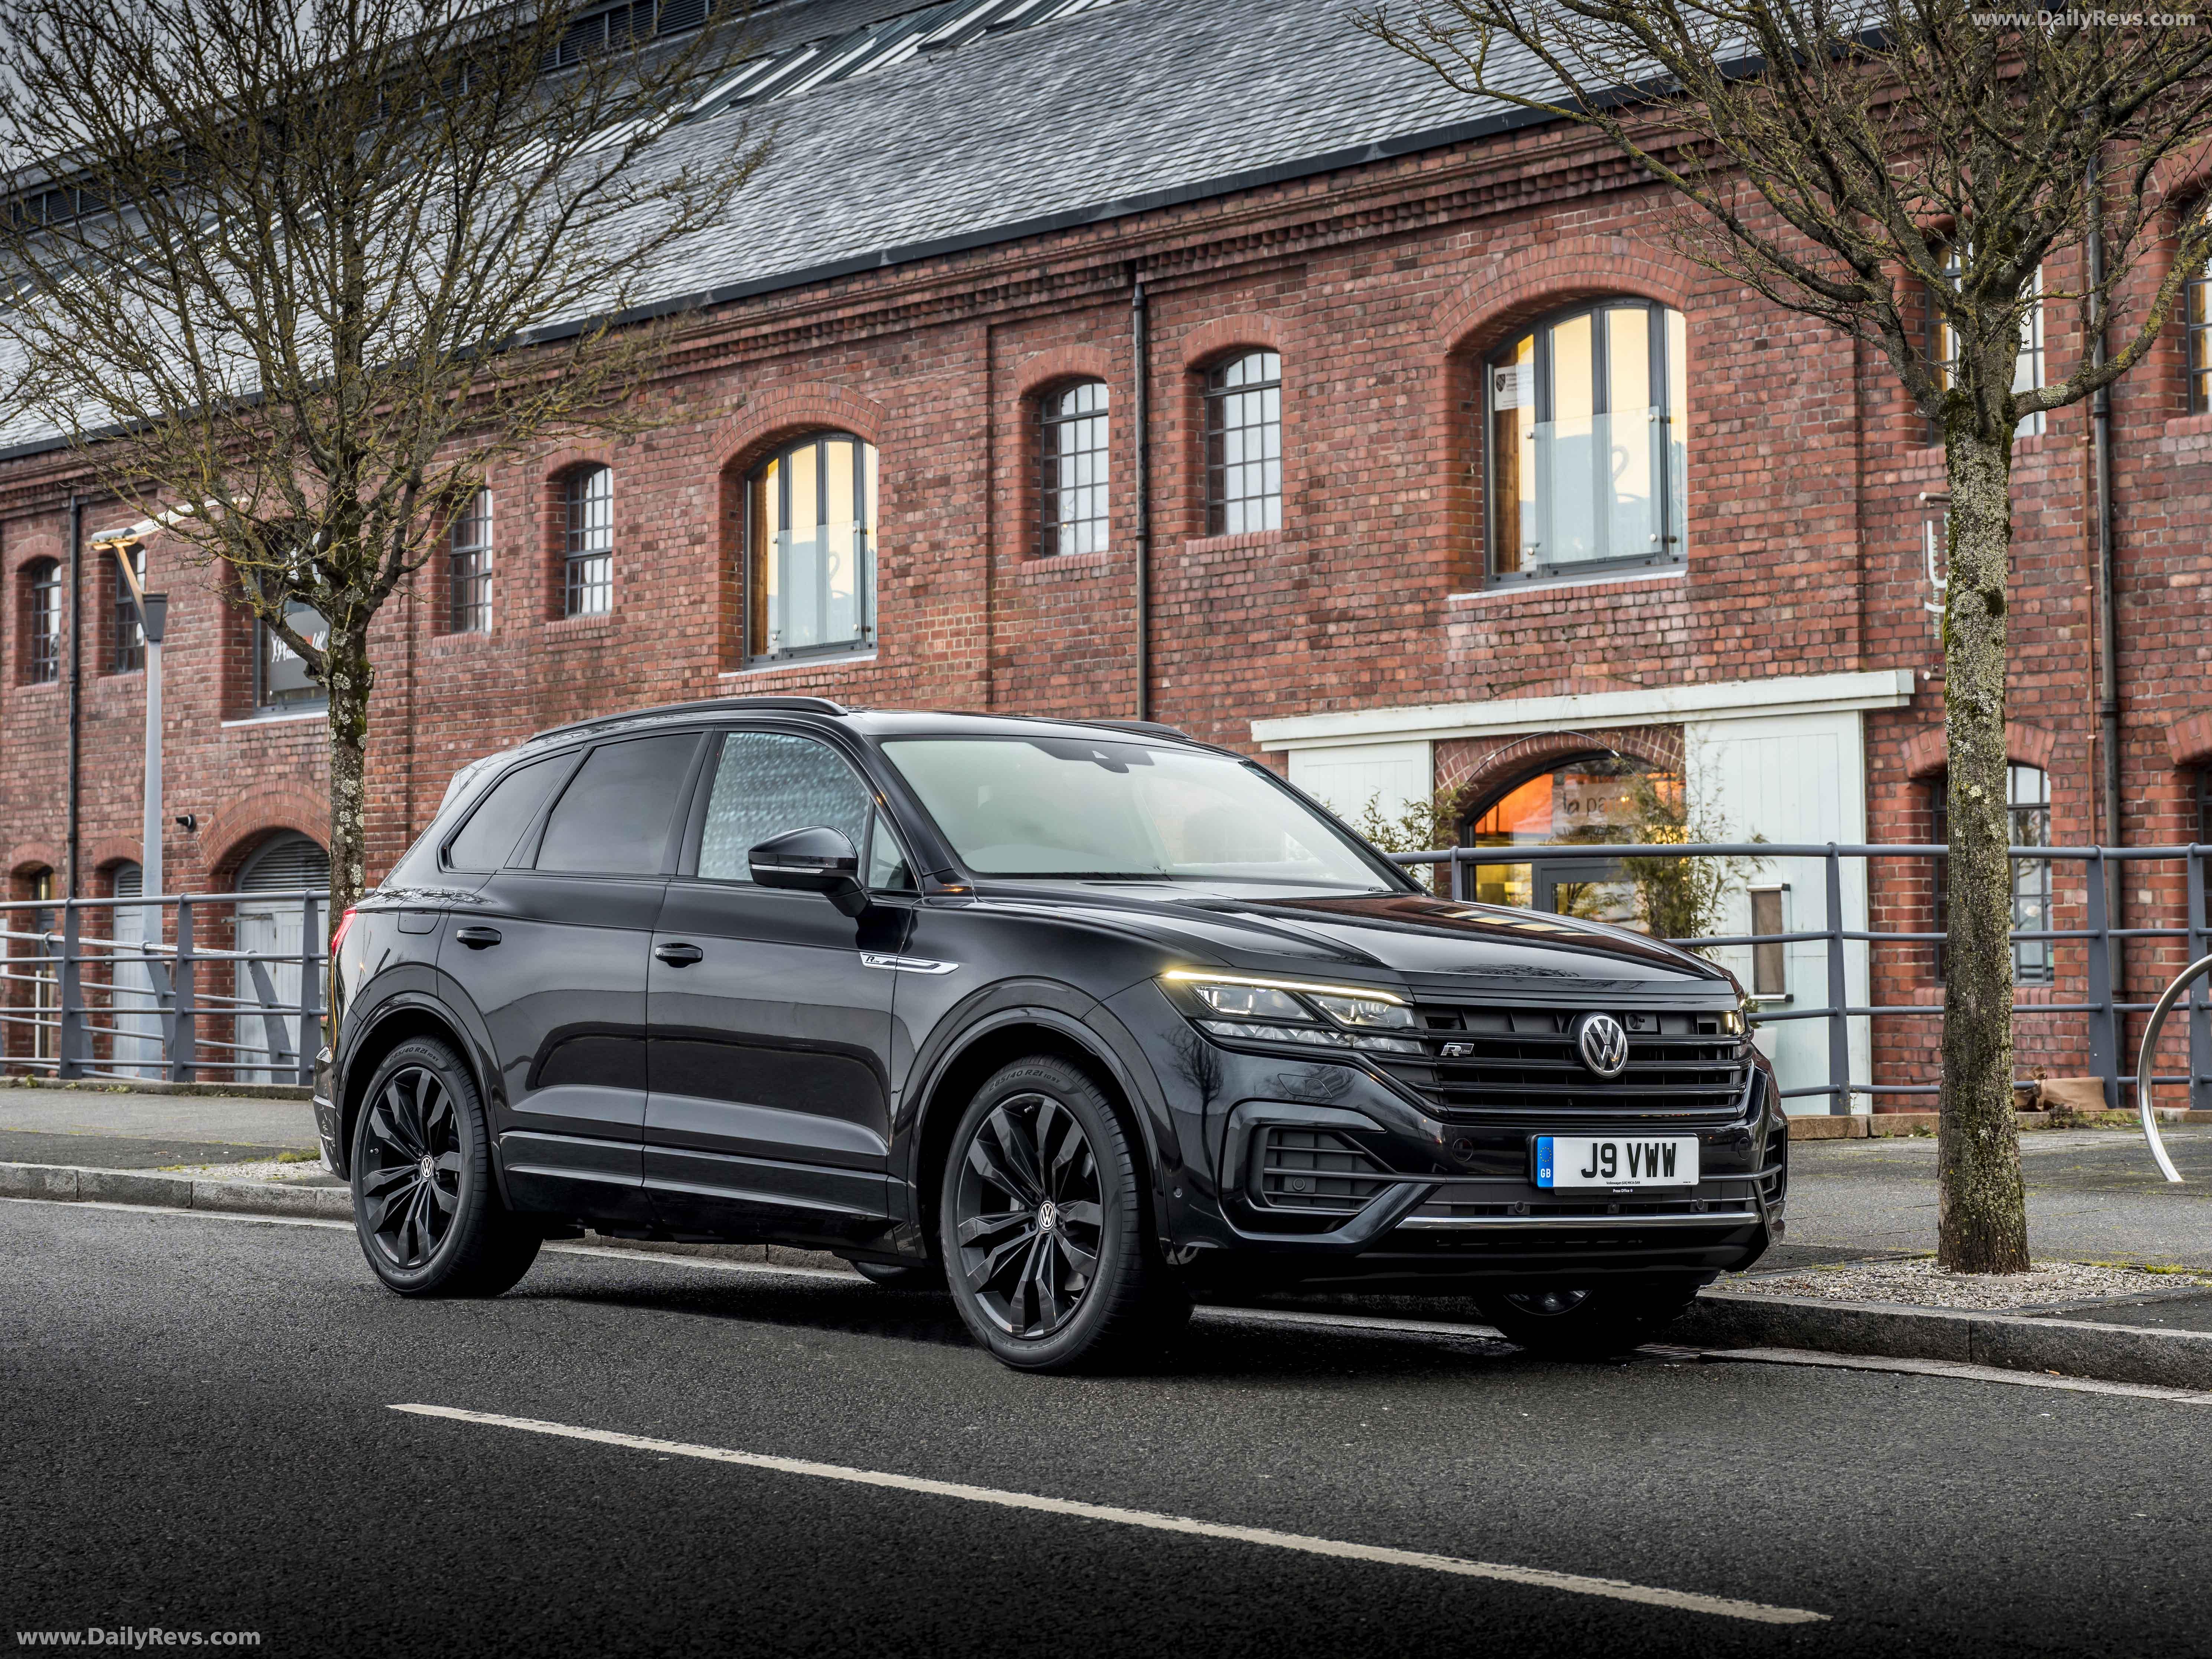 2020 Volkswagen Touareg Review